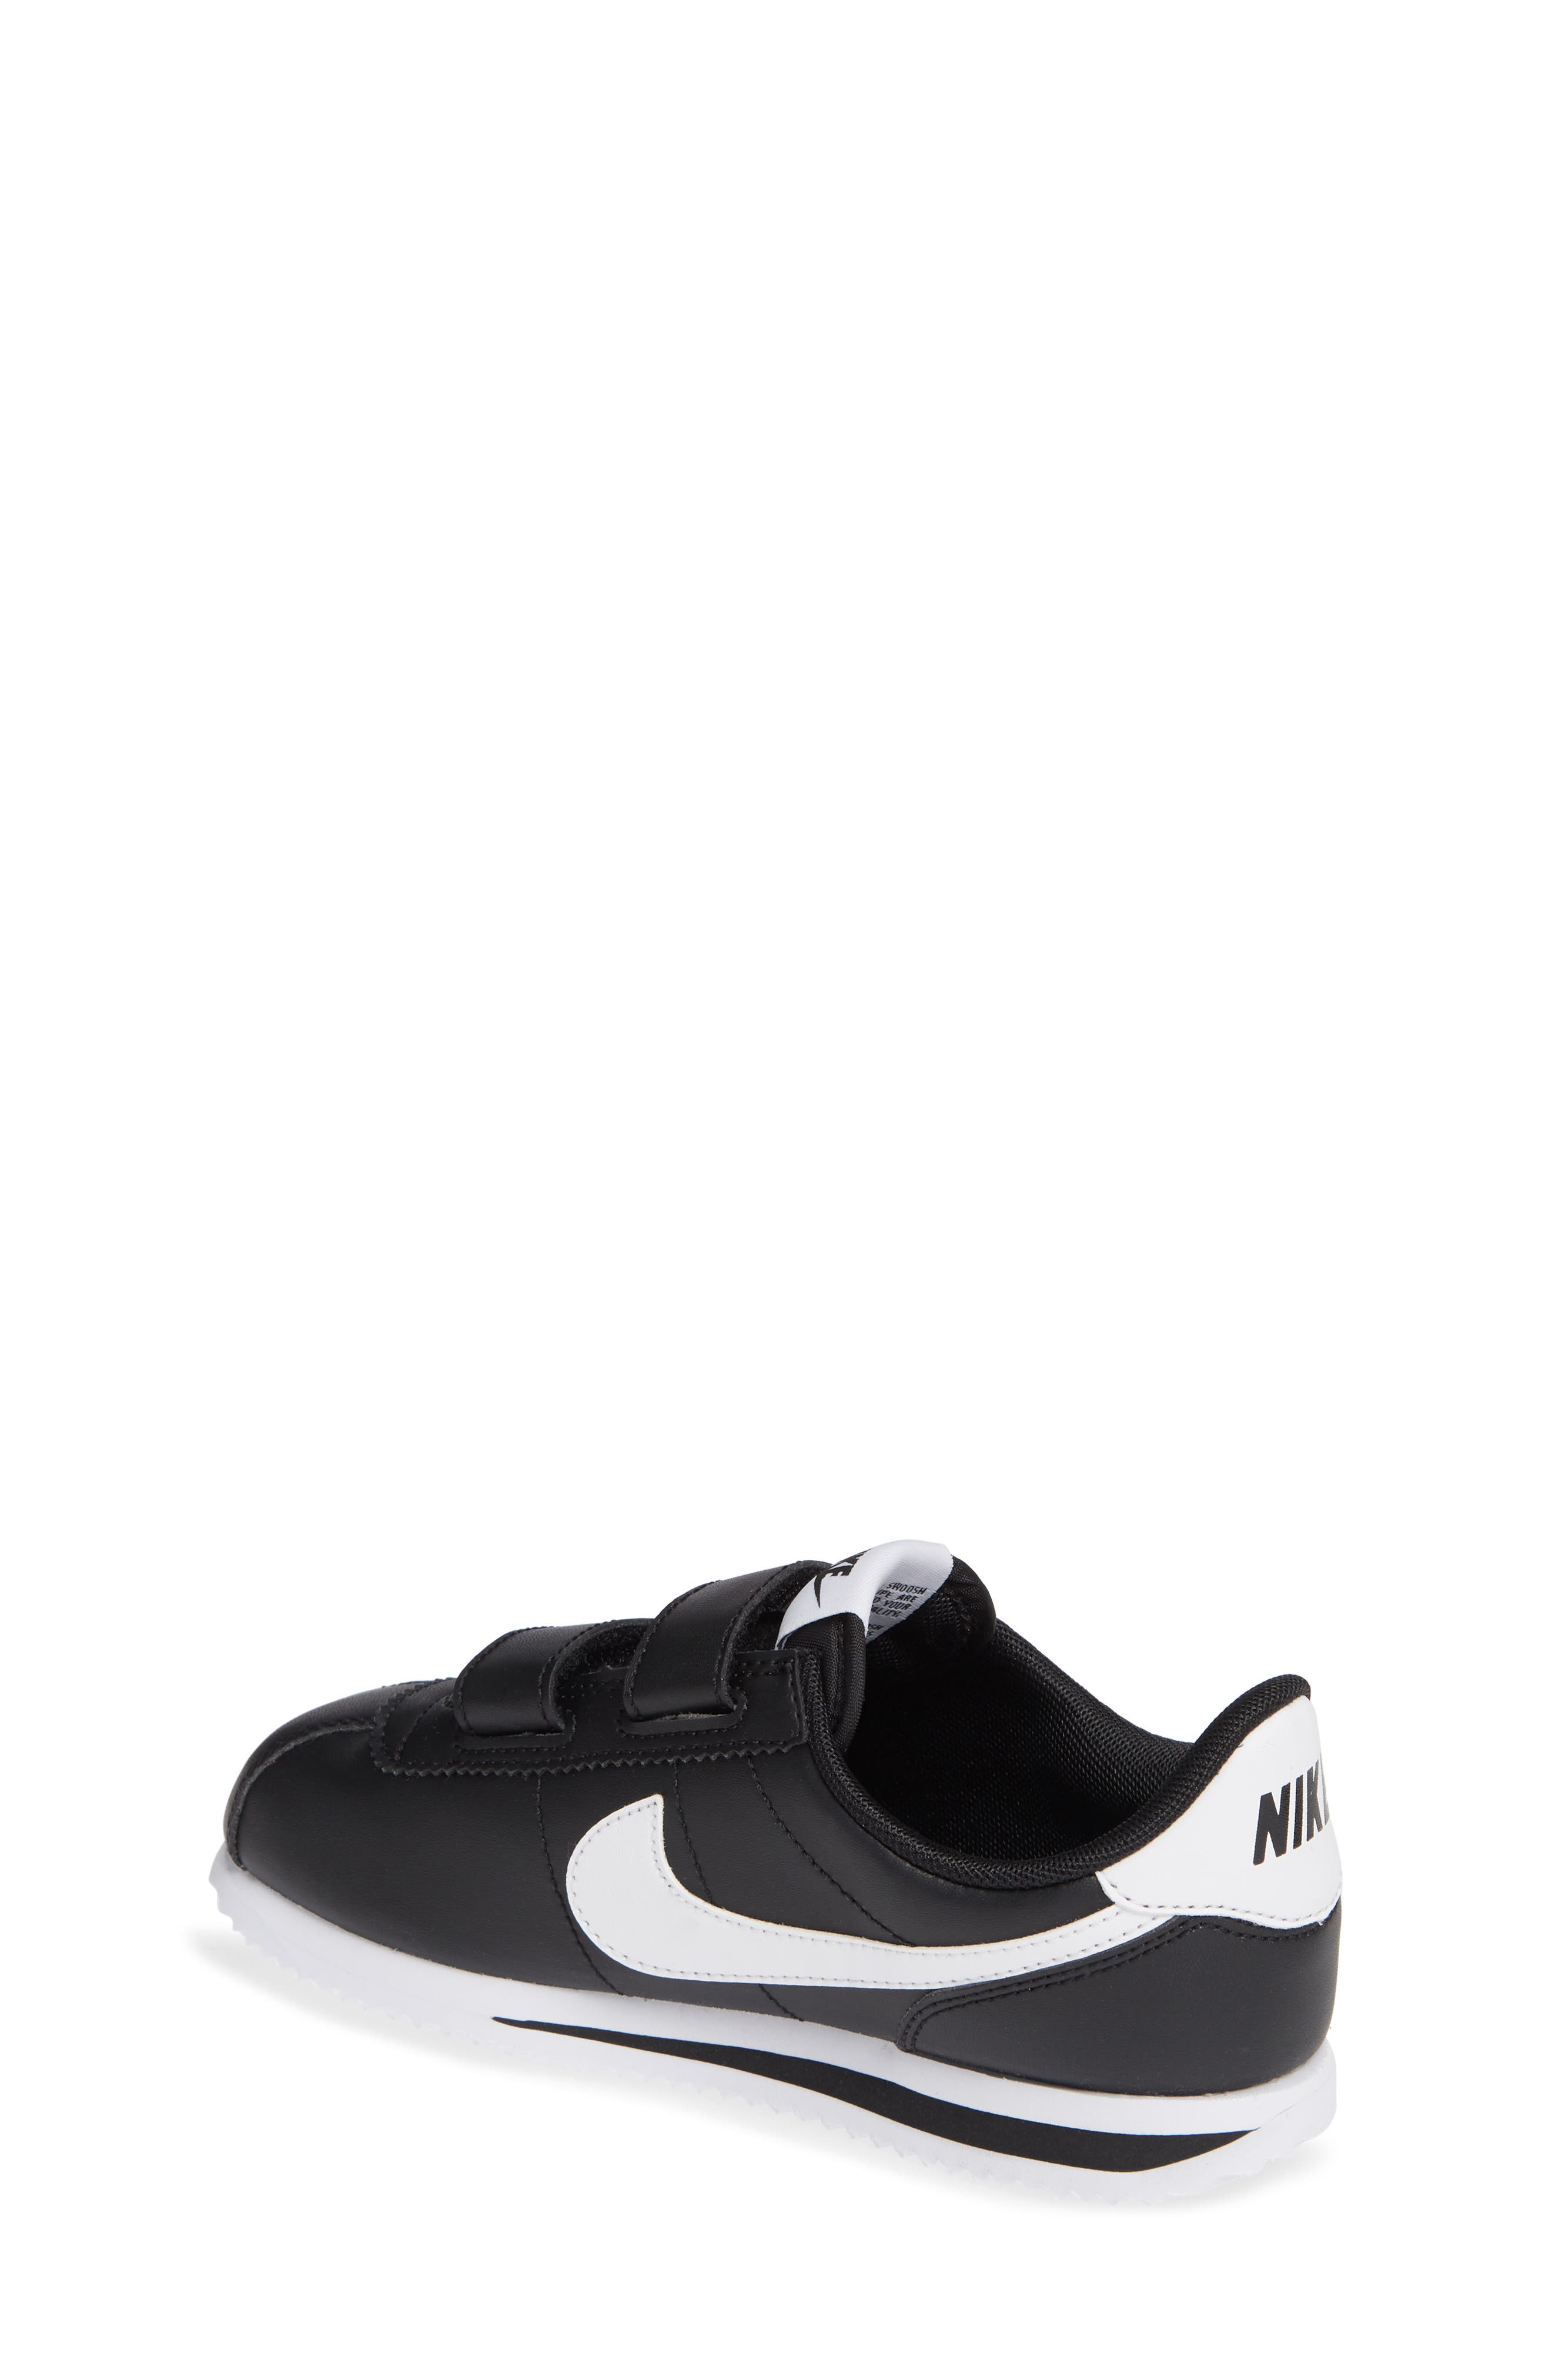 4bcf2ba49d94 Nike Baby Shoes